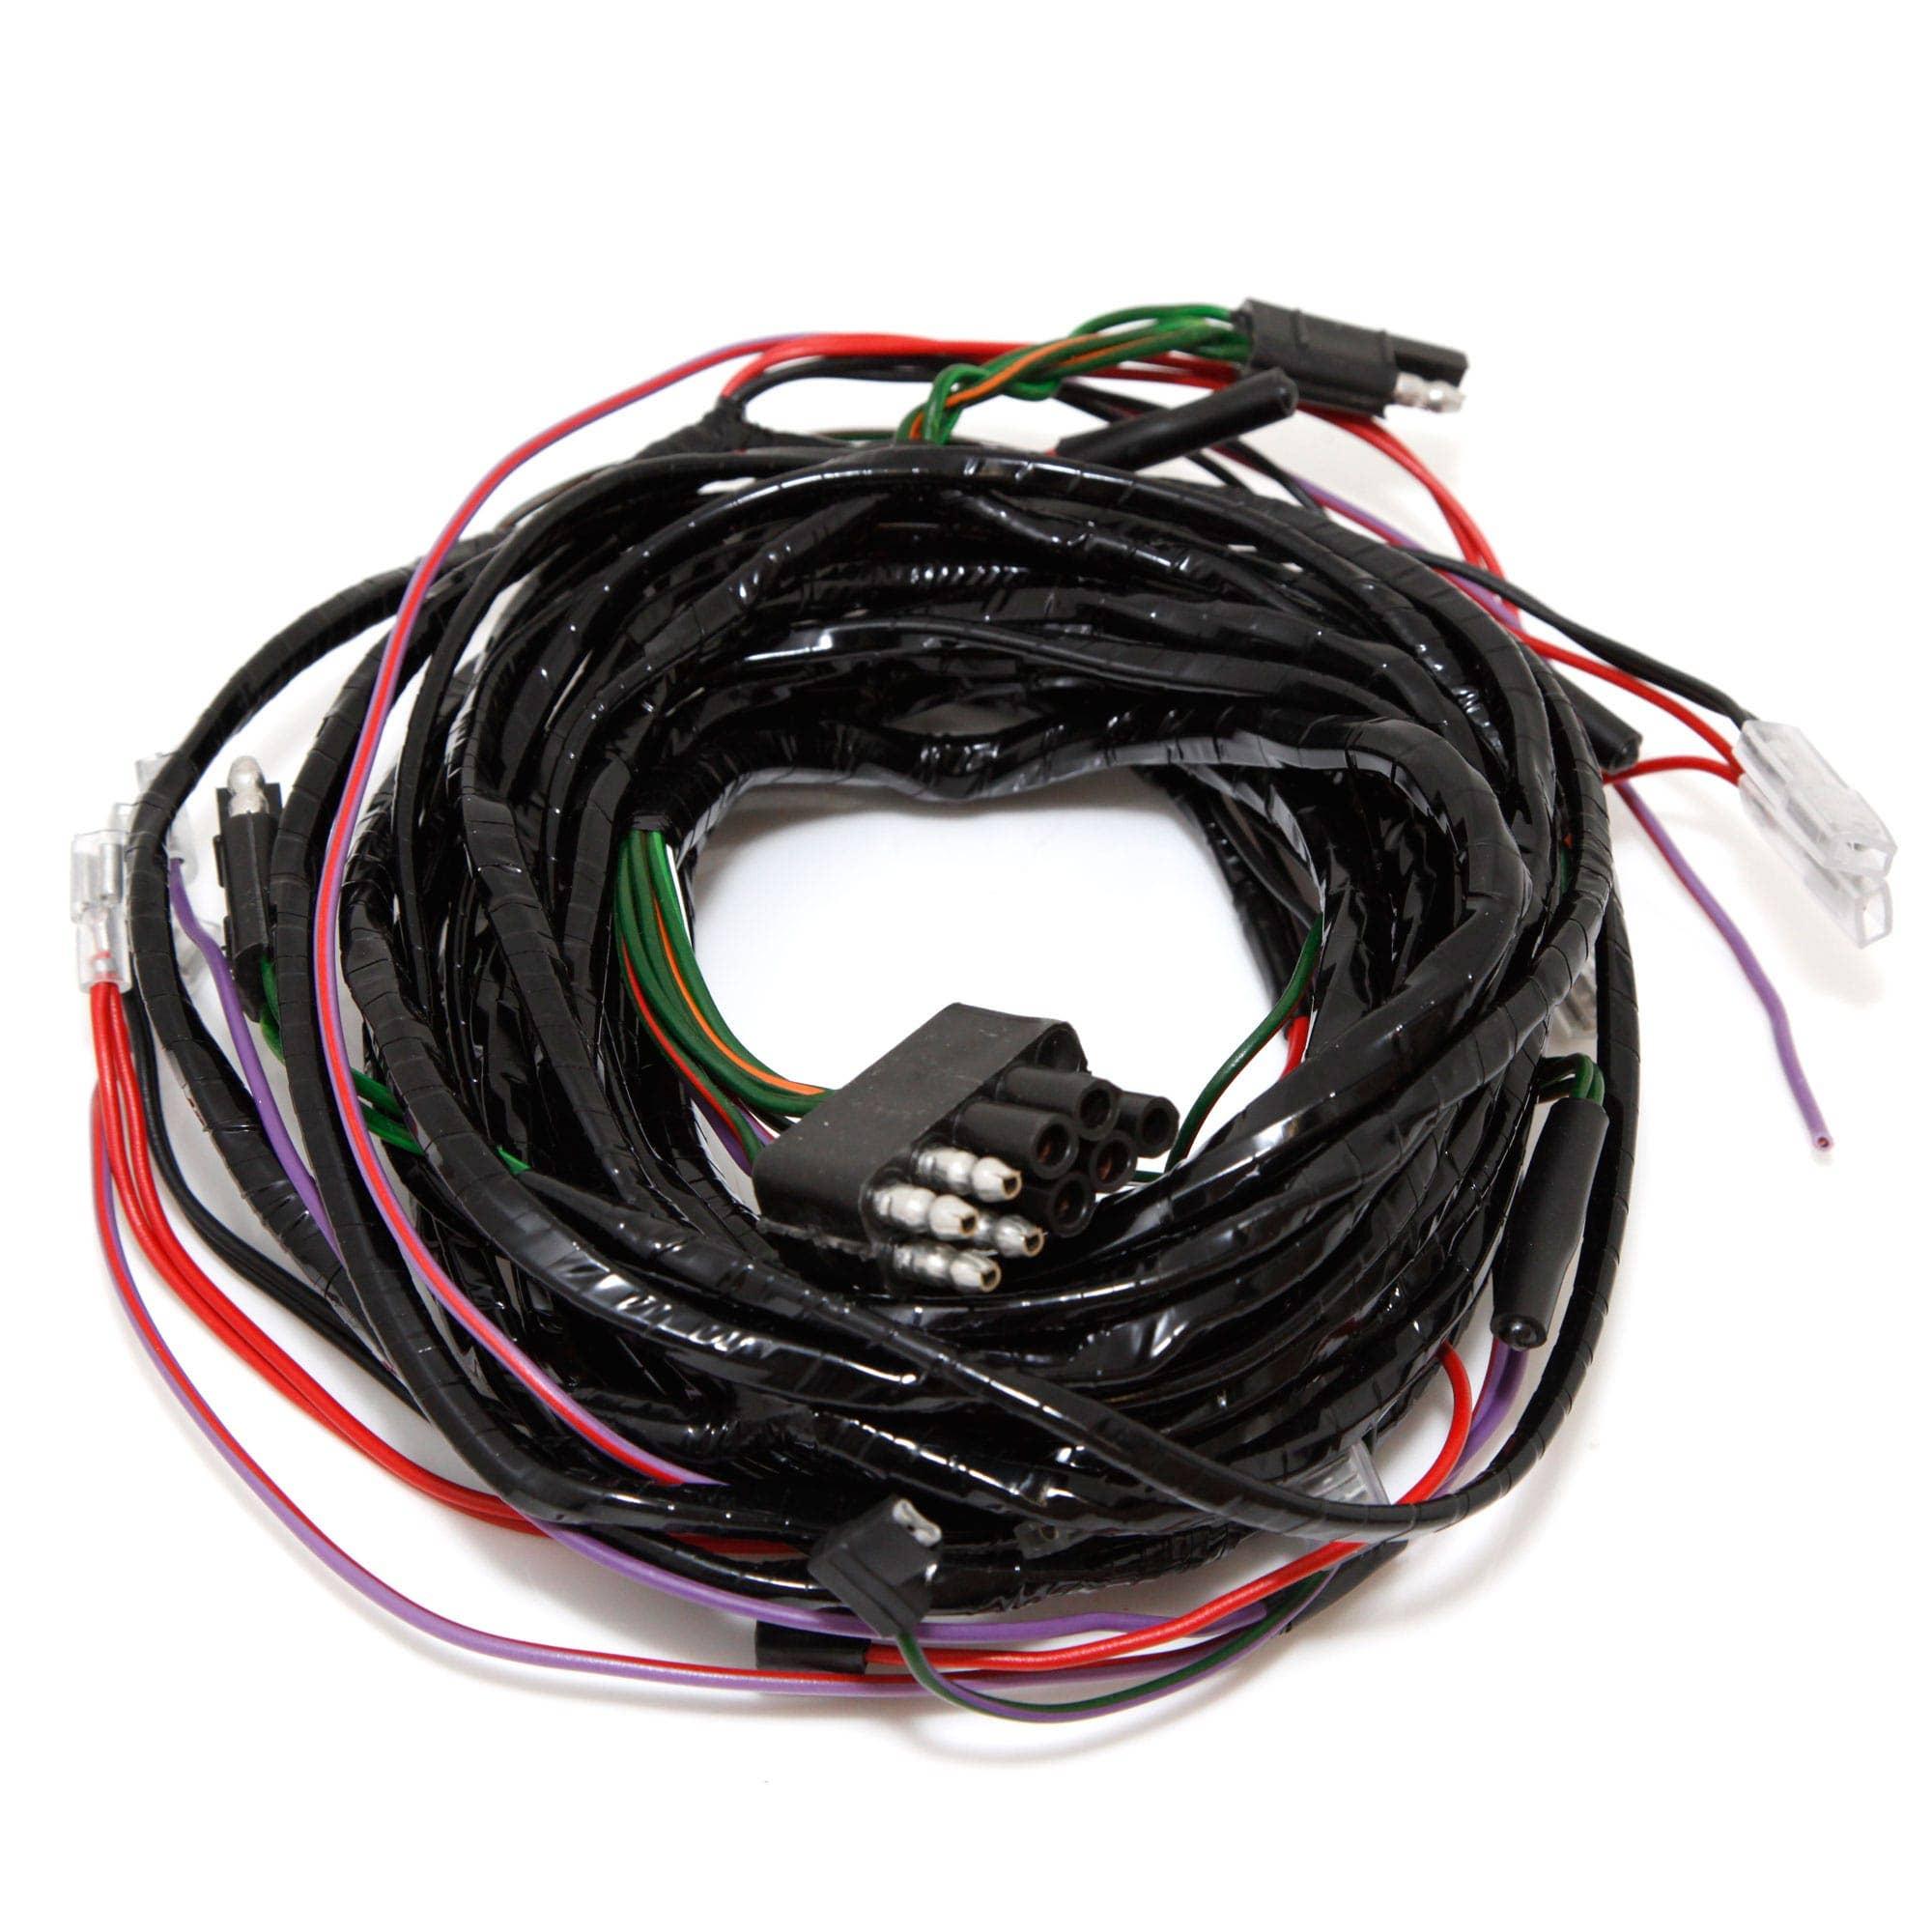 181 855 Diode Handbrake Warning Light Inline Moss Motors 1978 Mgb Wiring Harness Body Trunk